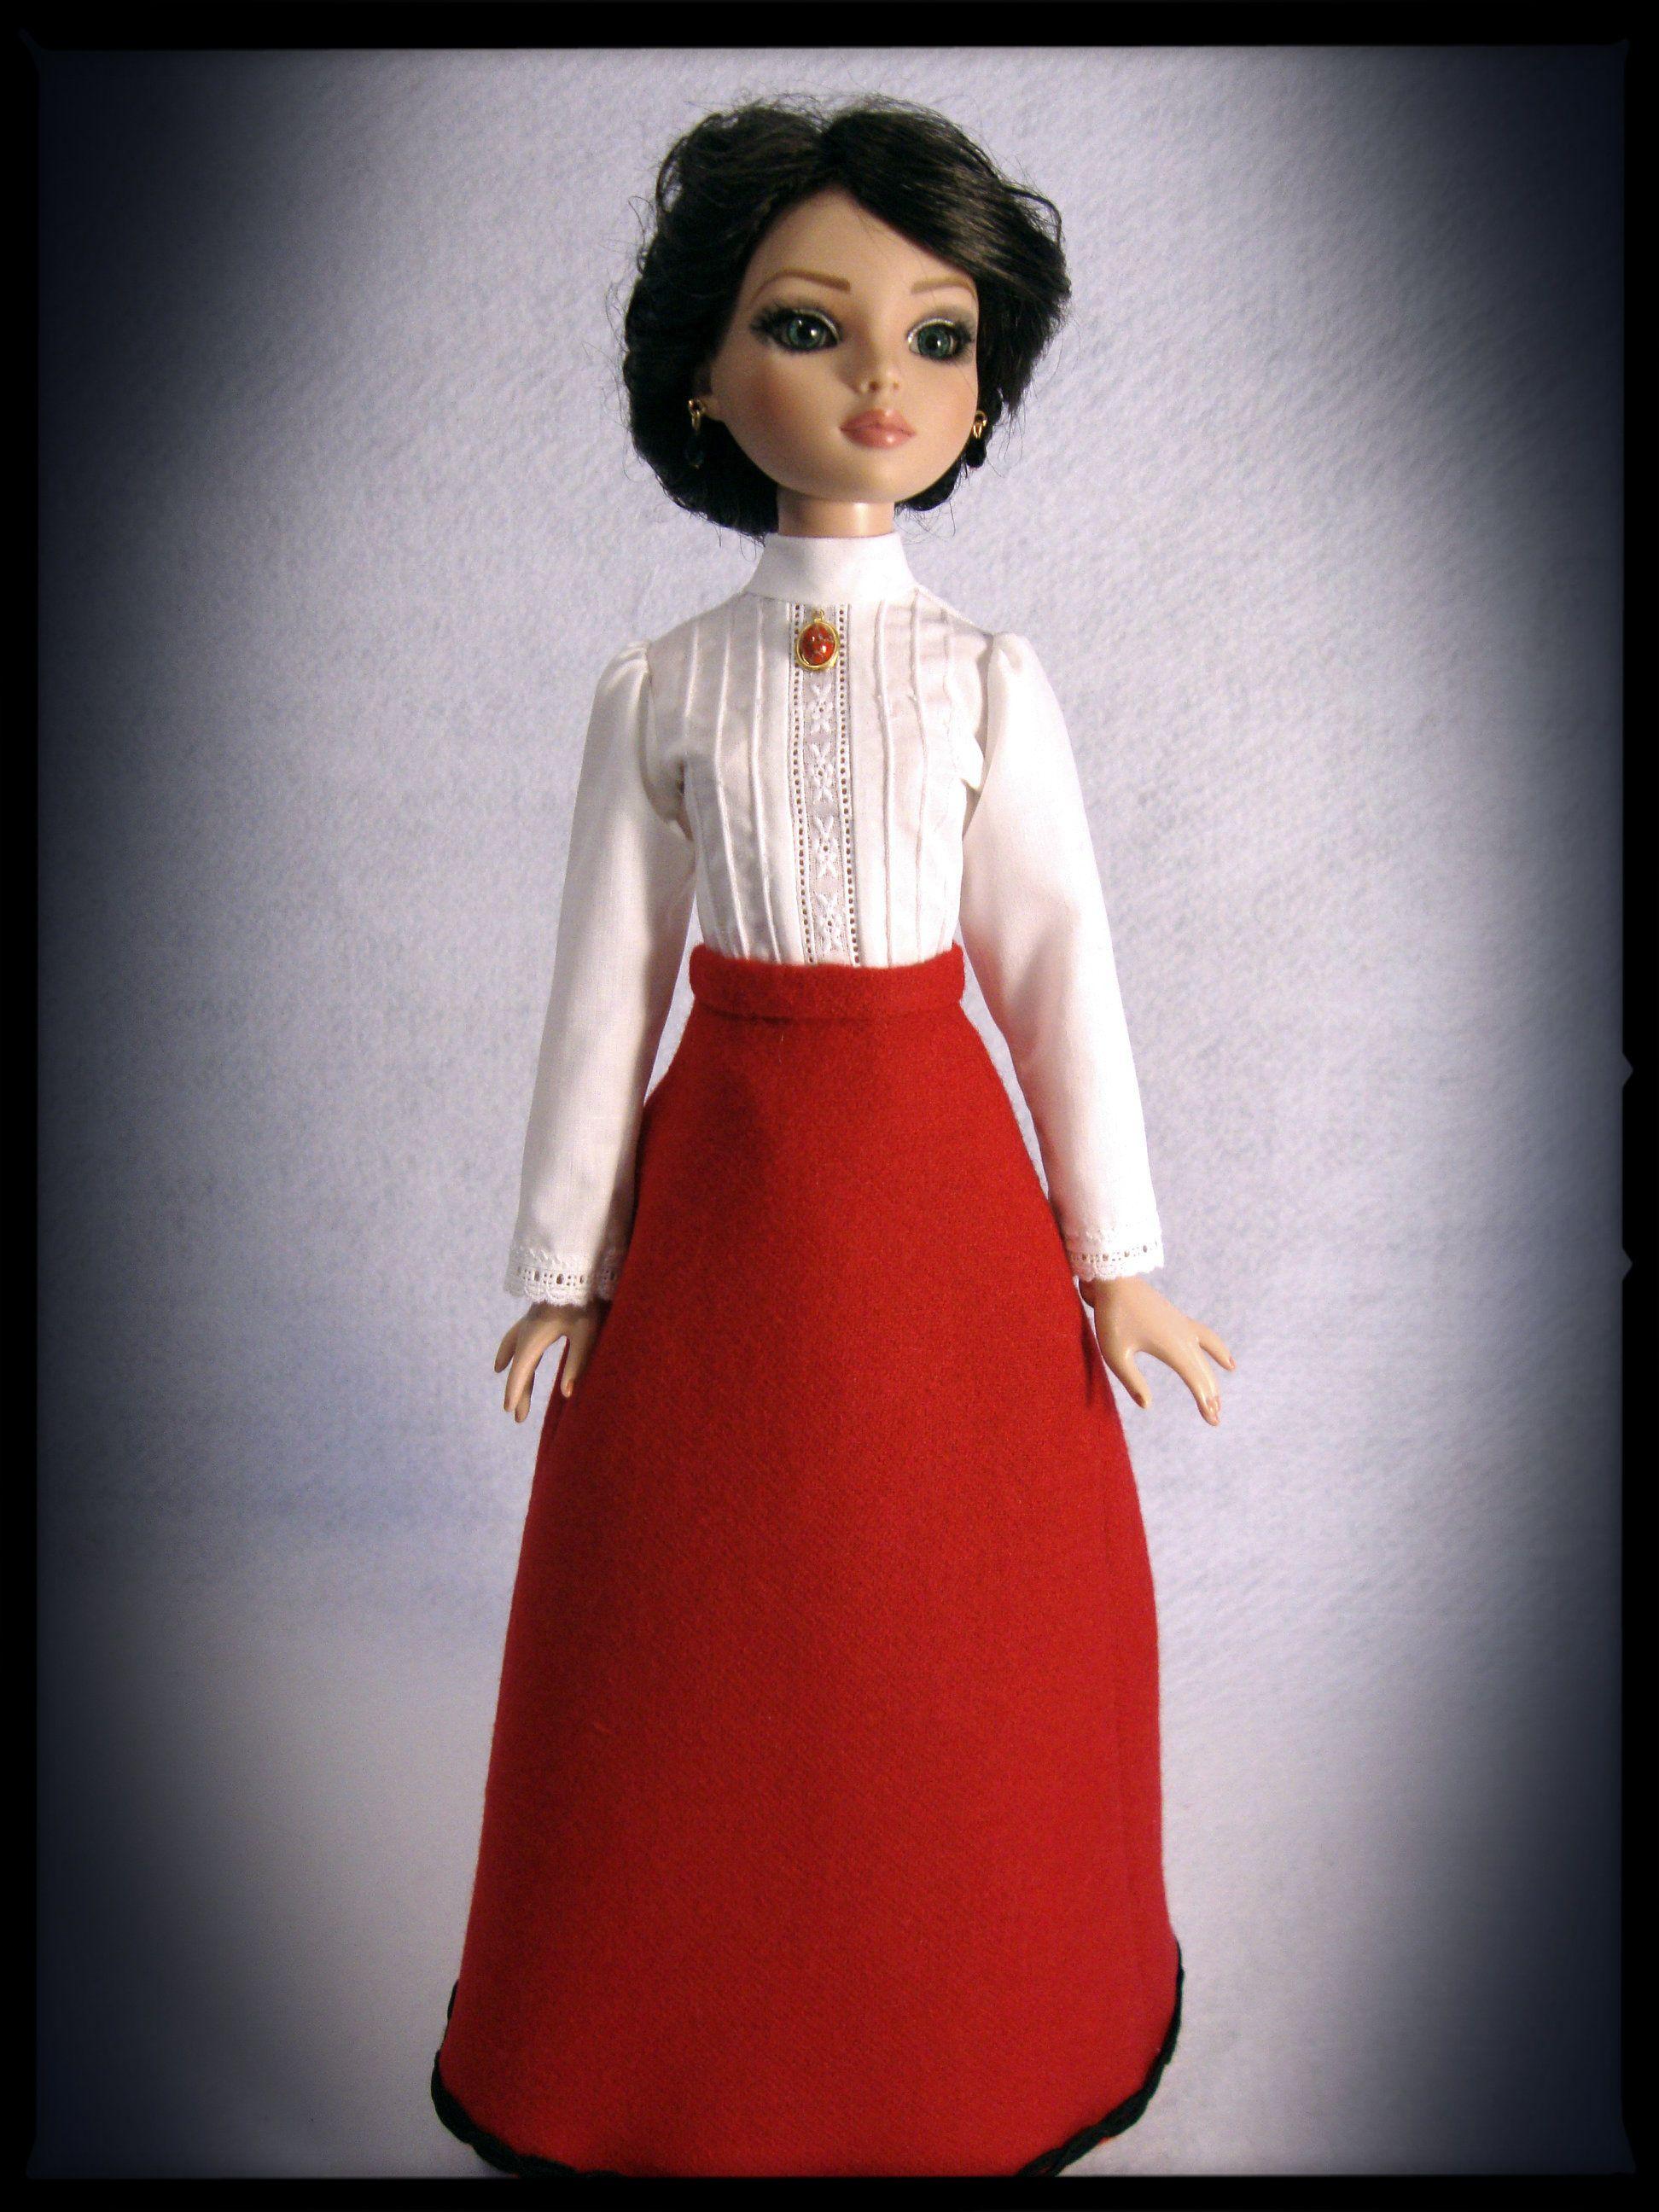 Blouse detail-red Edwardian oufit